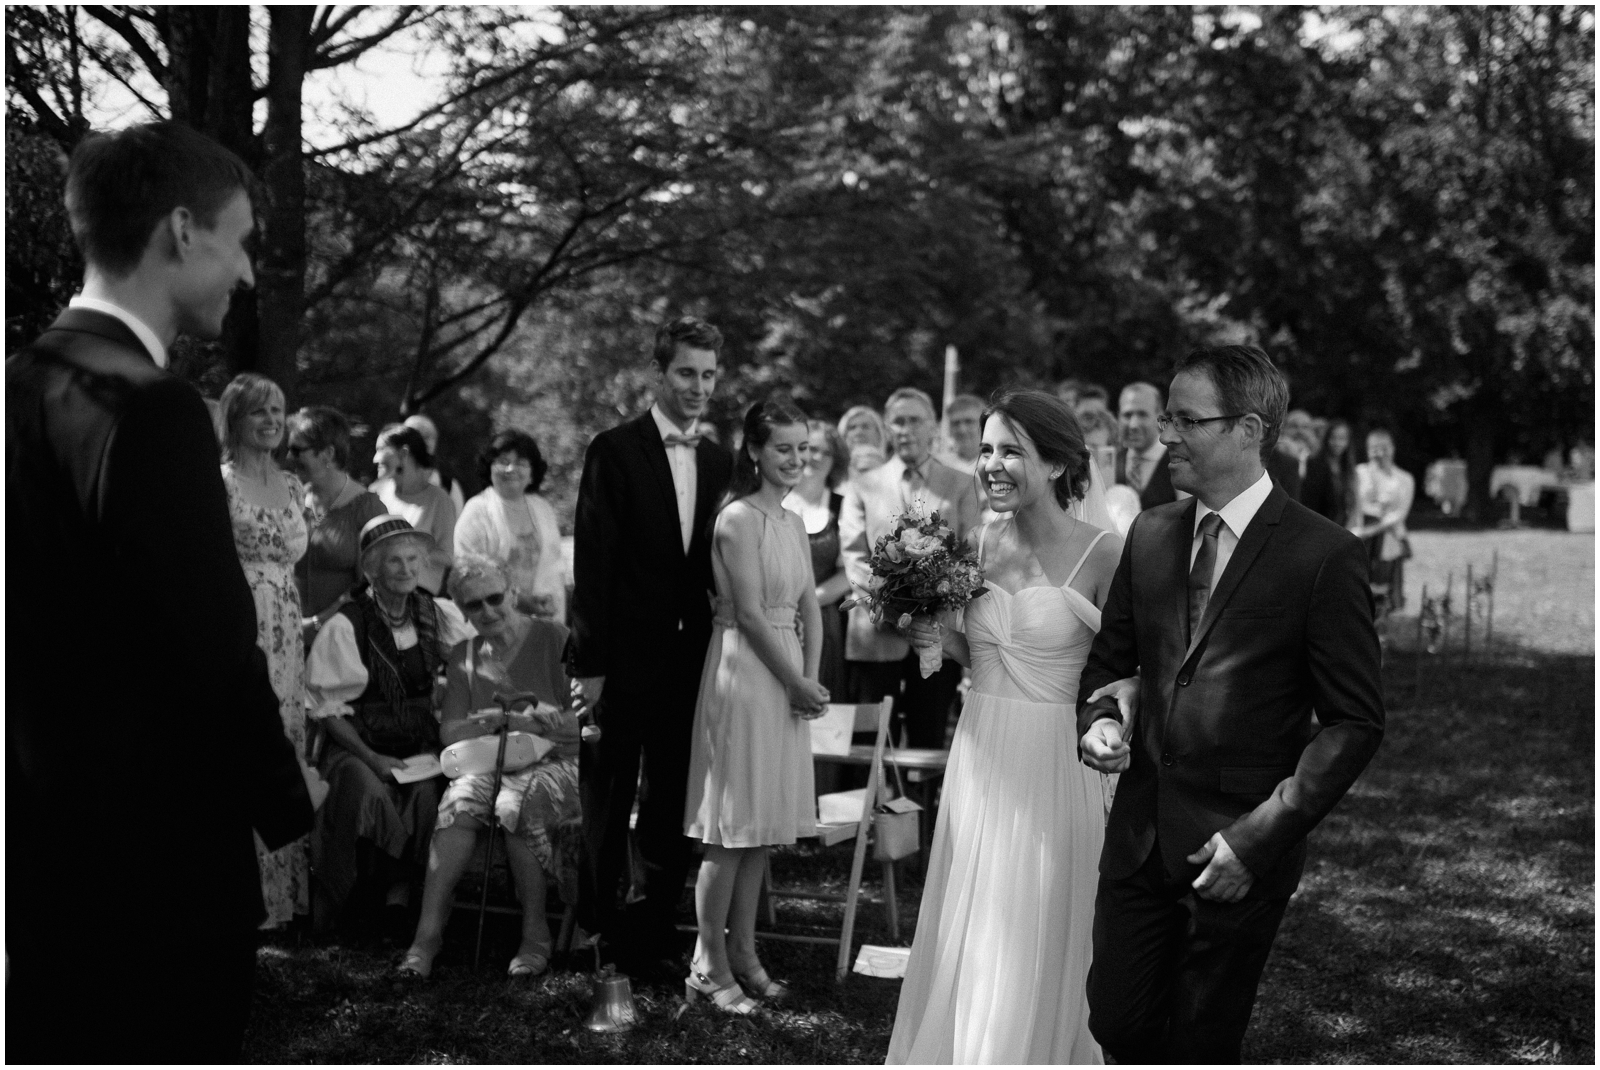 mirjam_thomas_wedding-321-2.jpg